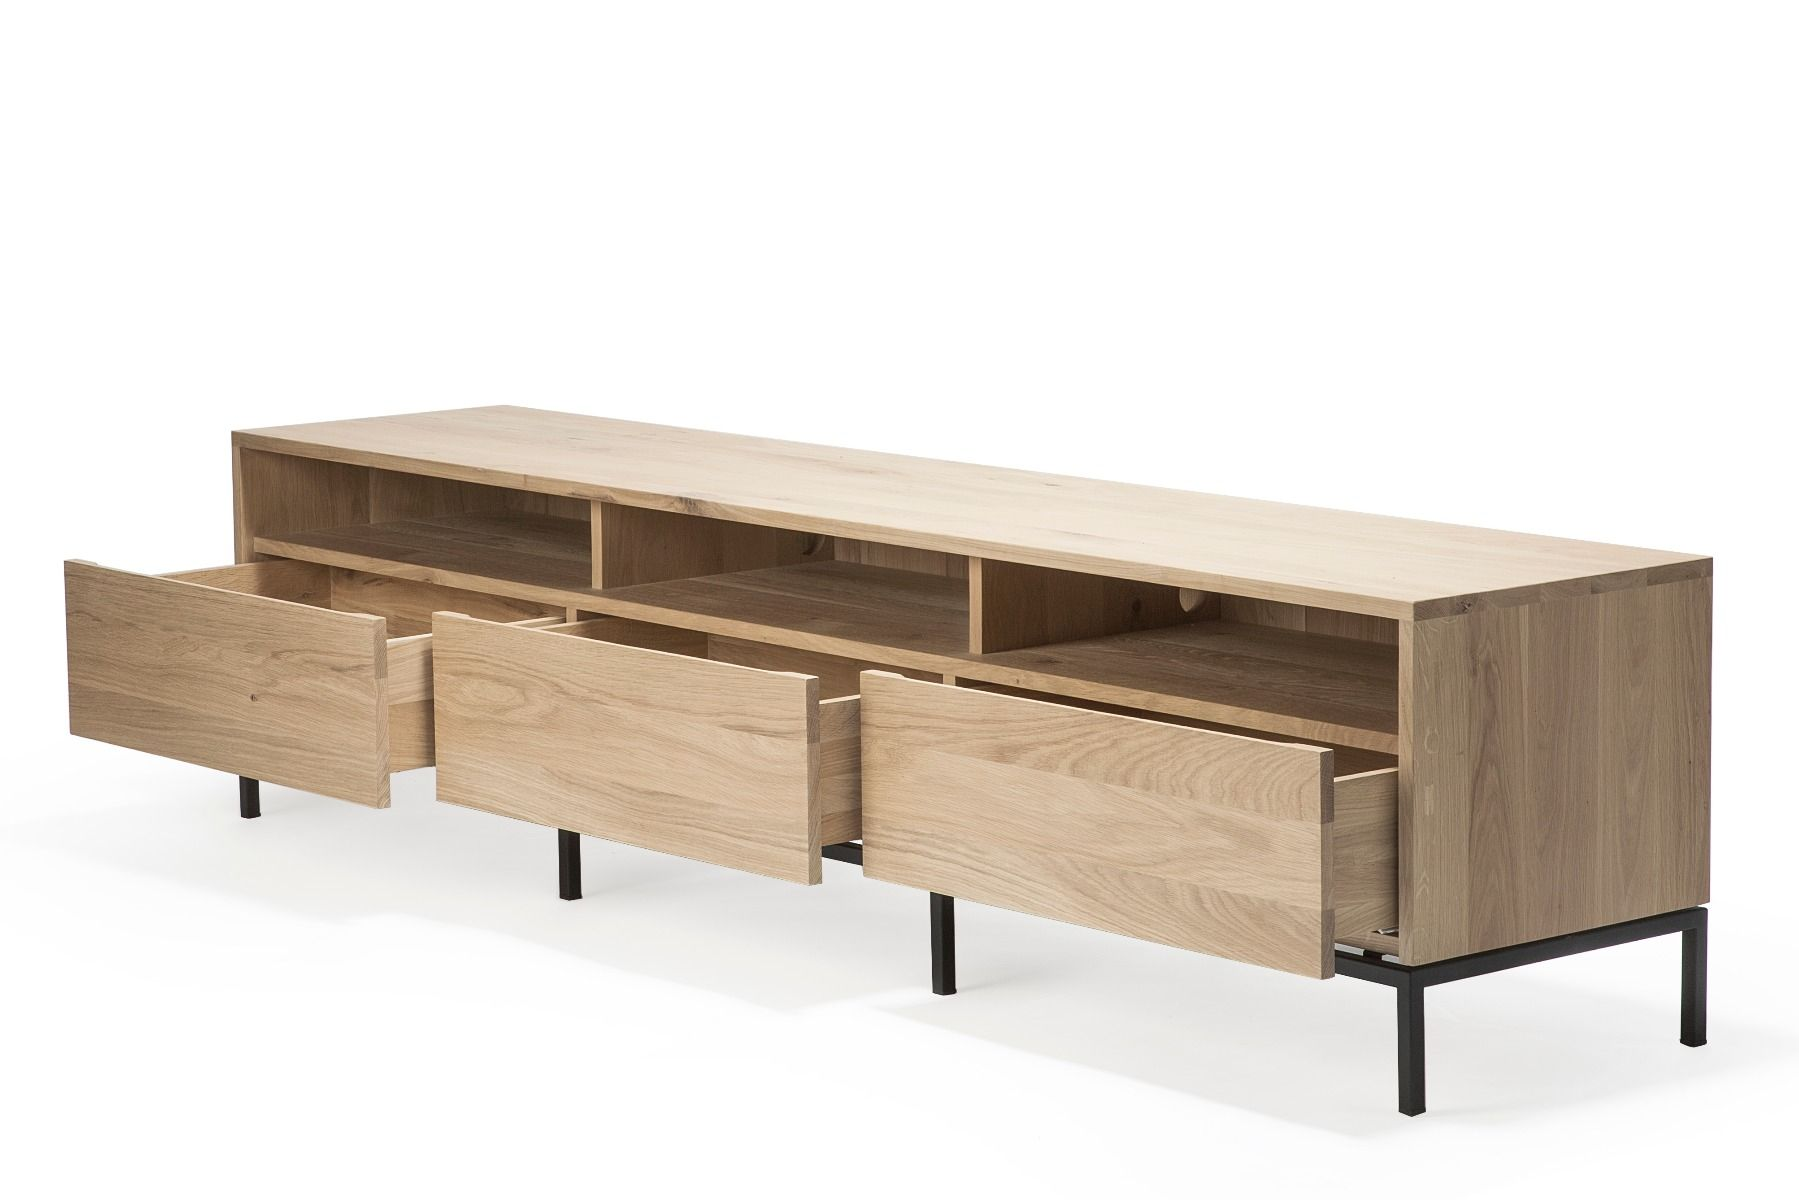 Ethnicraft Ligna TV Cupboard - Black three drawer